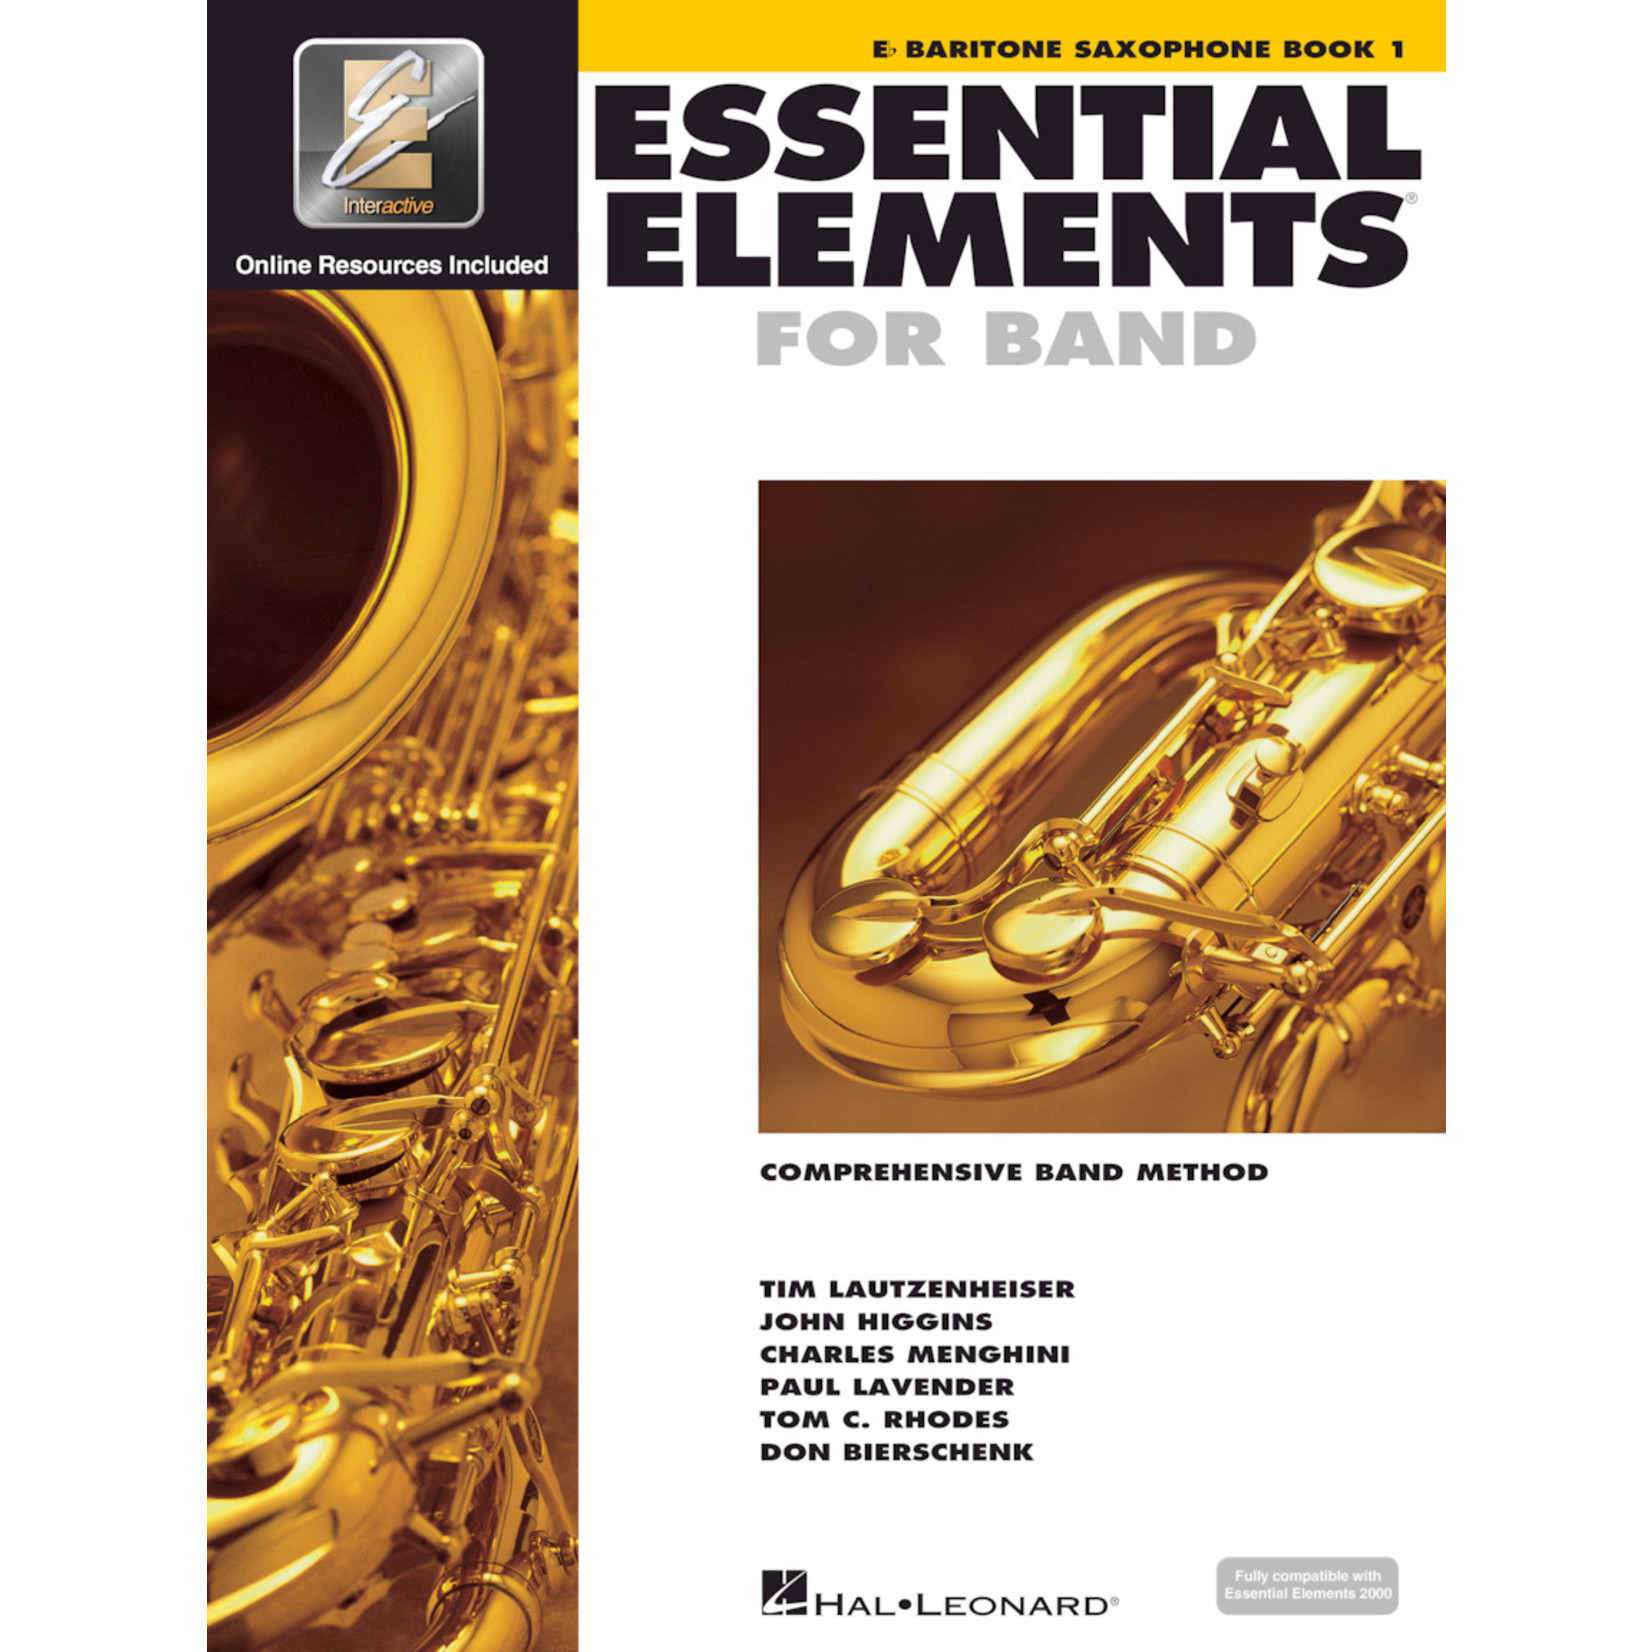 Hal Leonard Essential Elements for Band Baritone Saxophone Book 1